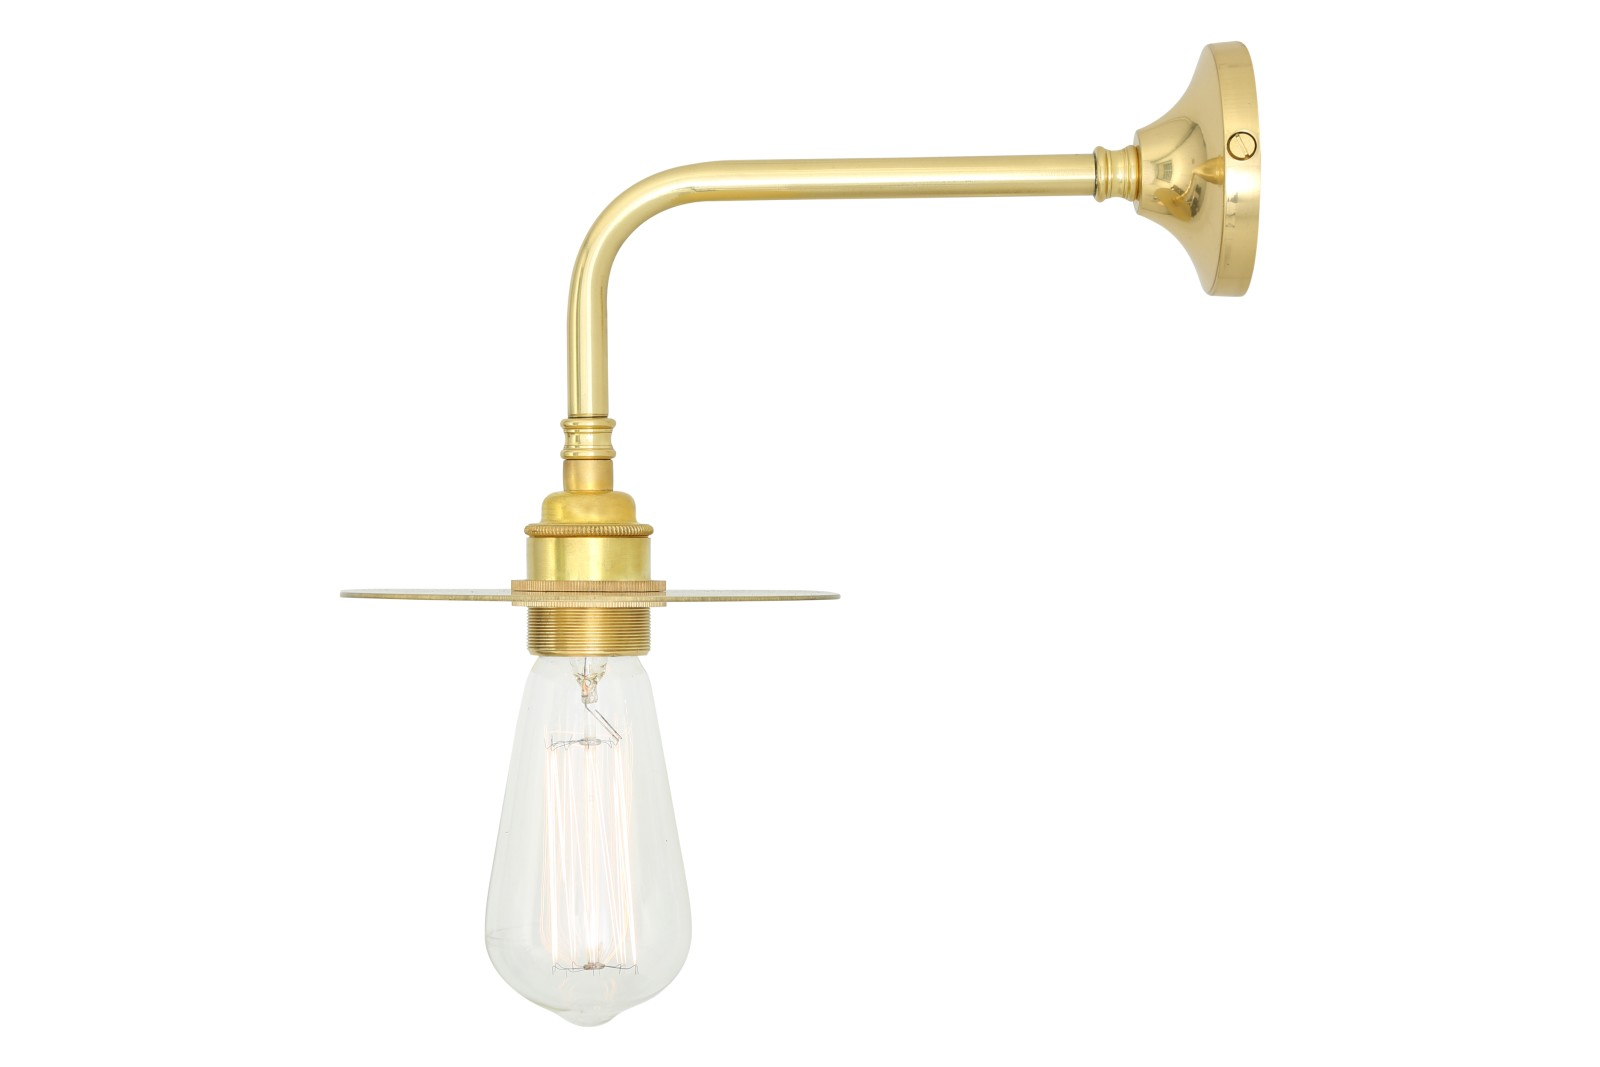 Kigoma Modern MLWL363 Wall Light Polished Brass